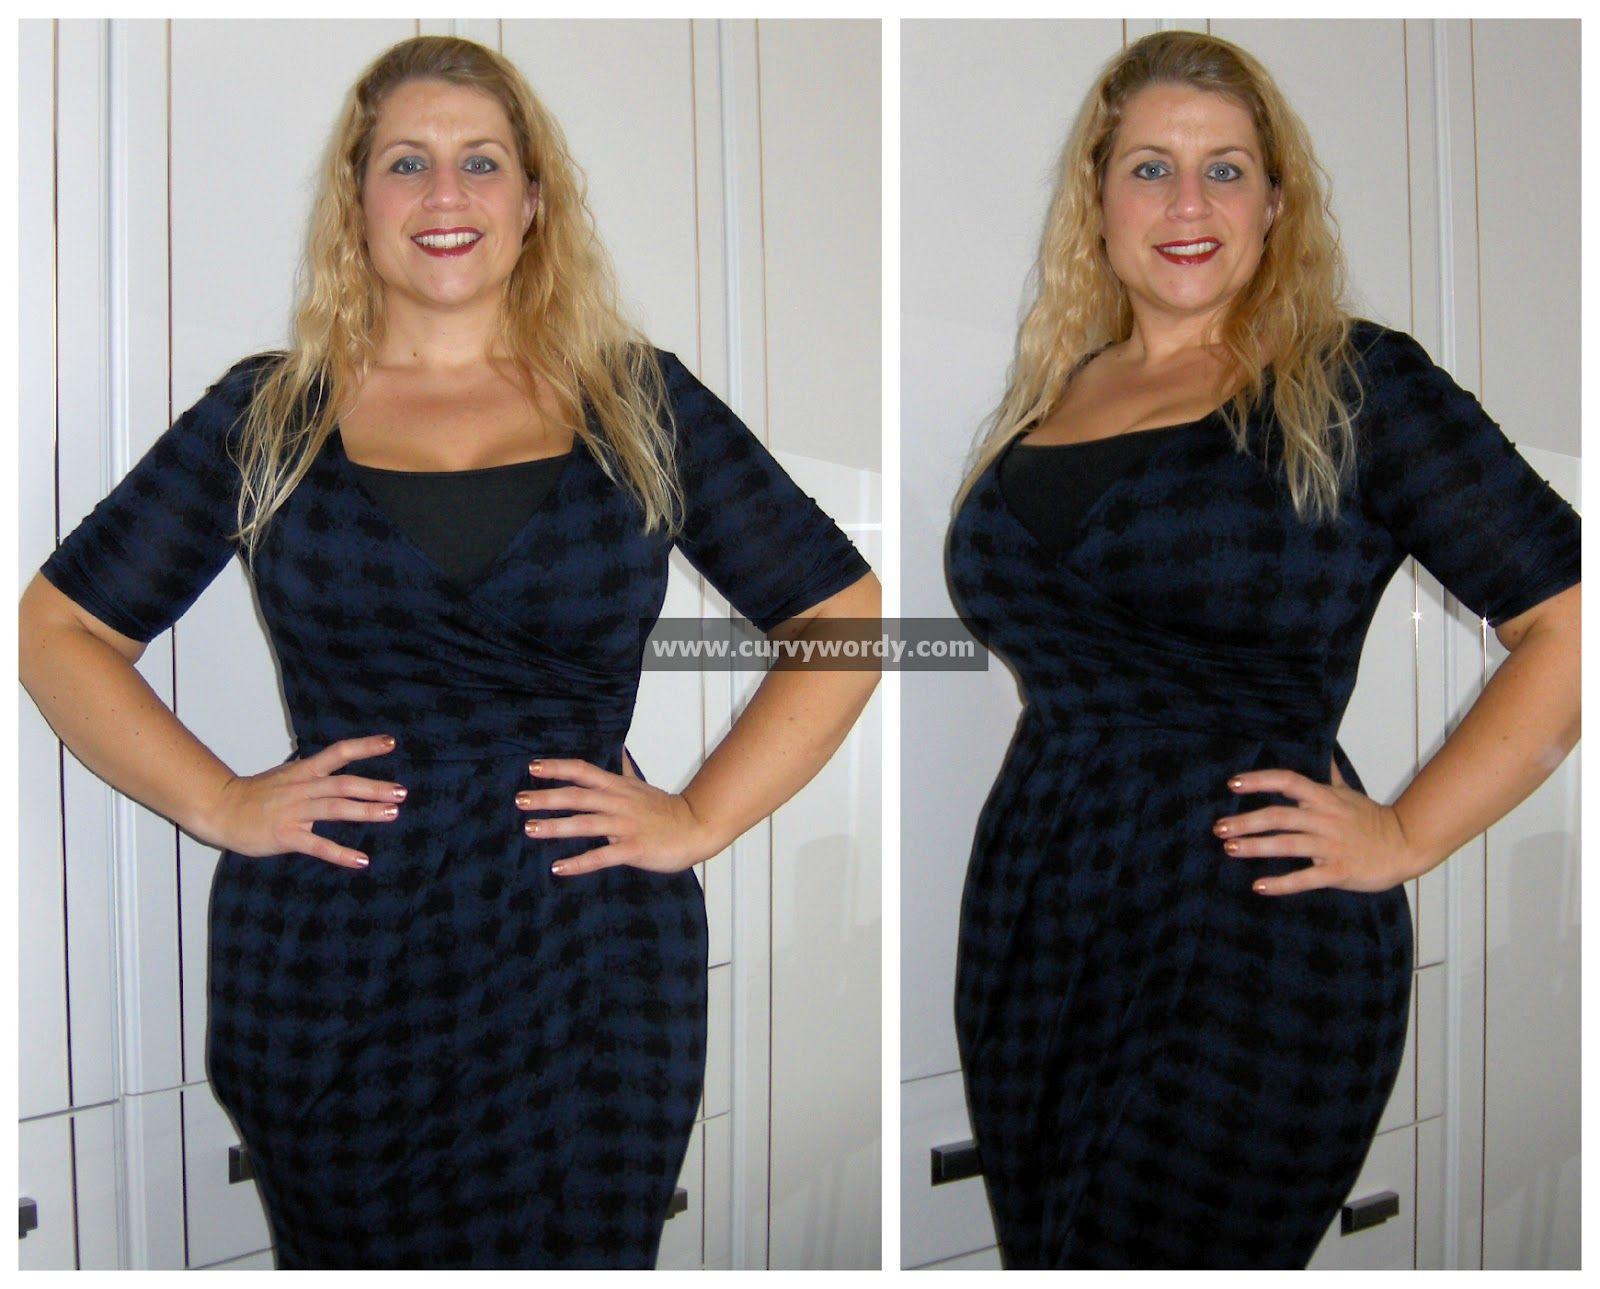 255b537088a Curvy Wordy  Dyeing the George at Asda Moda Printed Jersey Dress ...